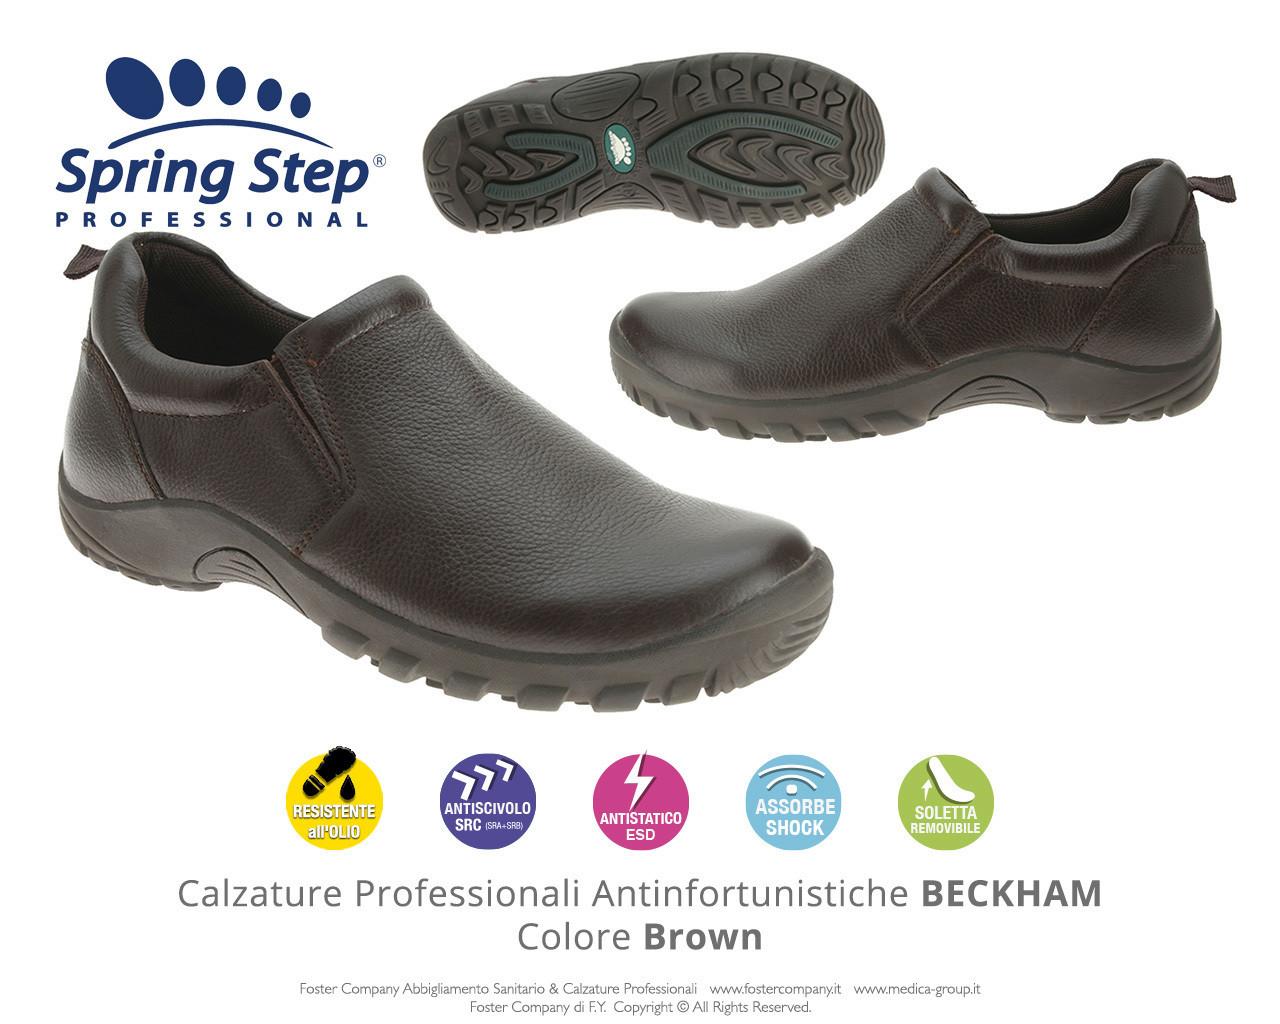 Calzature Professionali Spring Step BECKHAM Colore Brown